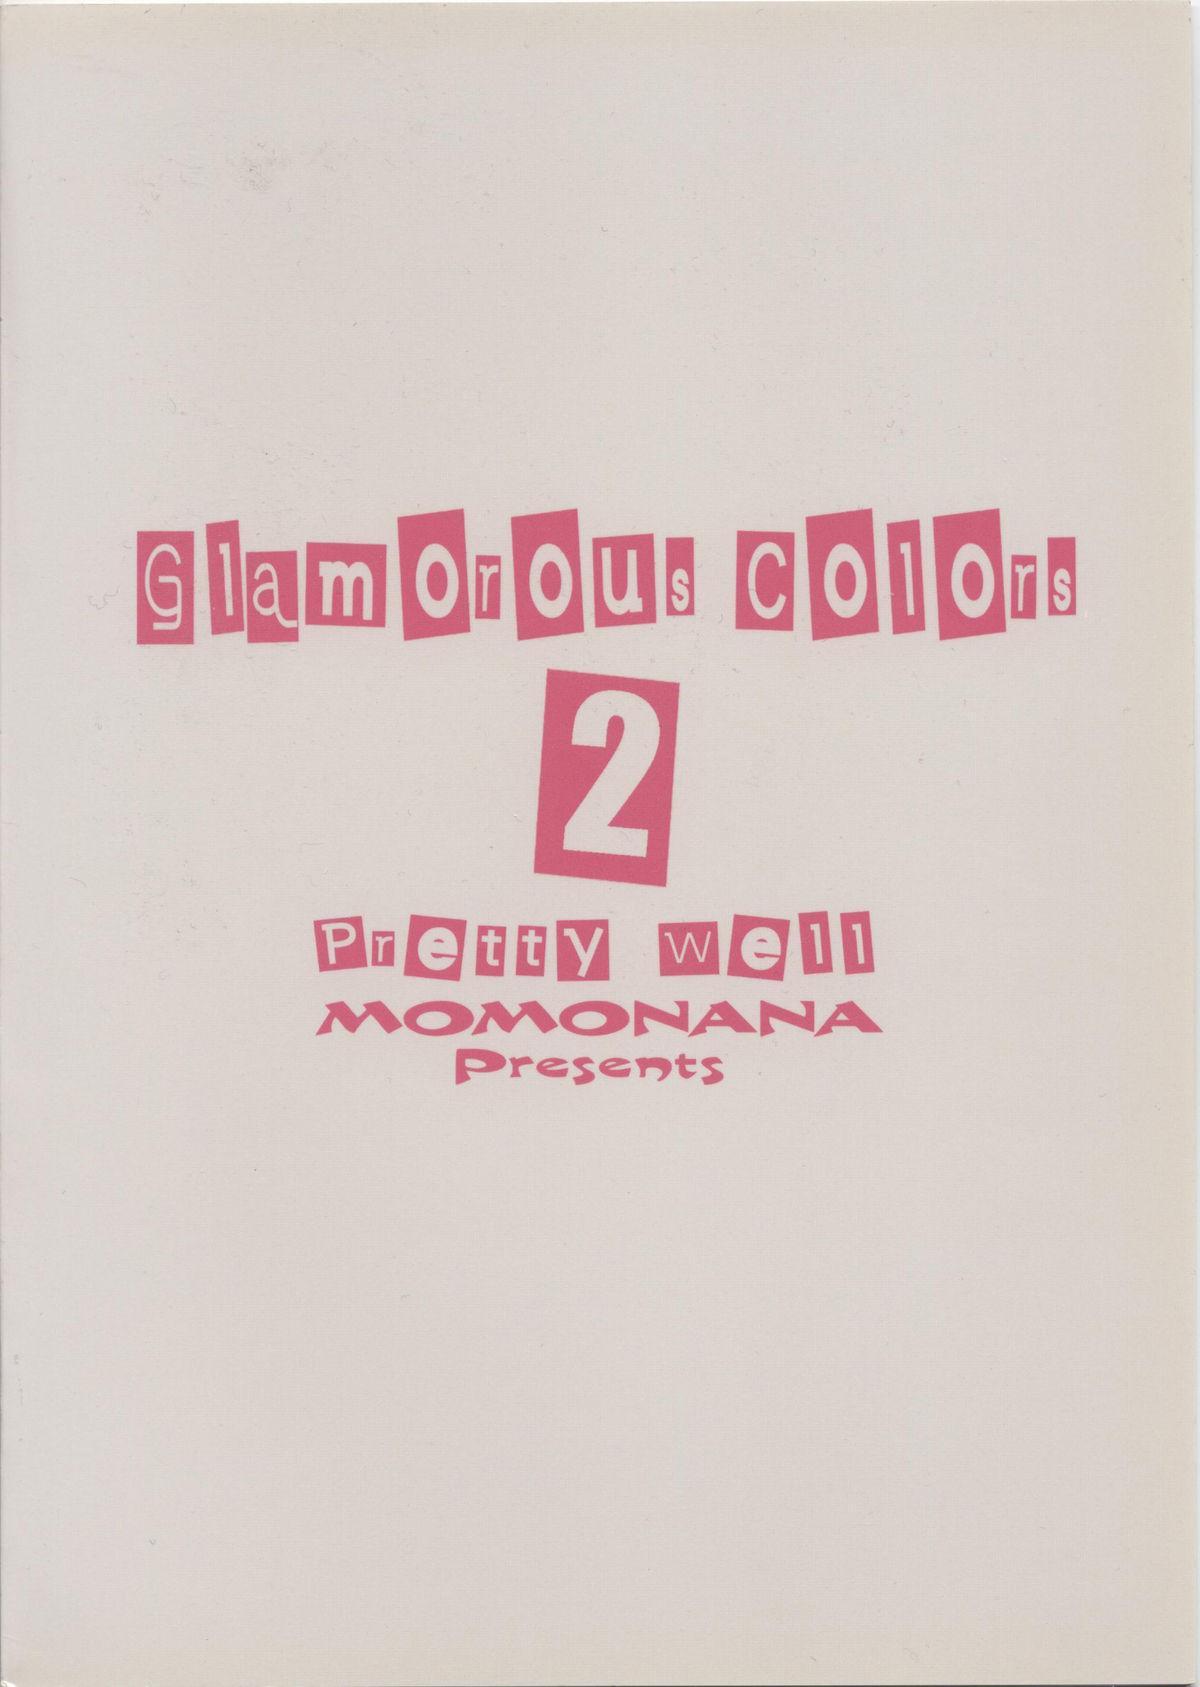 Glamorous Colors 2 21